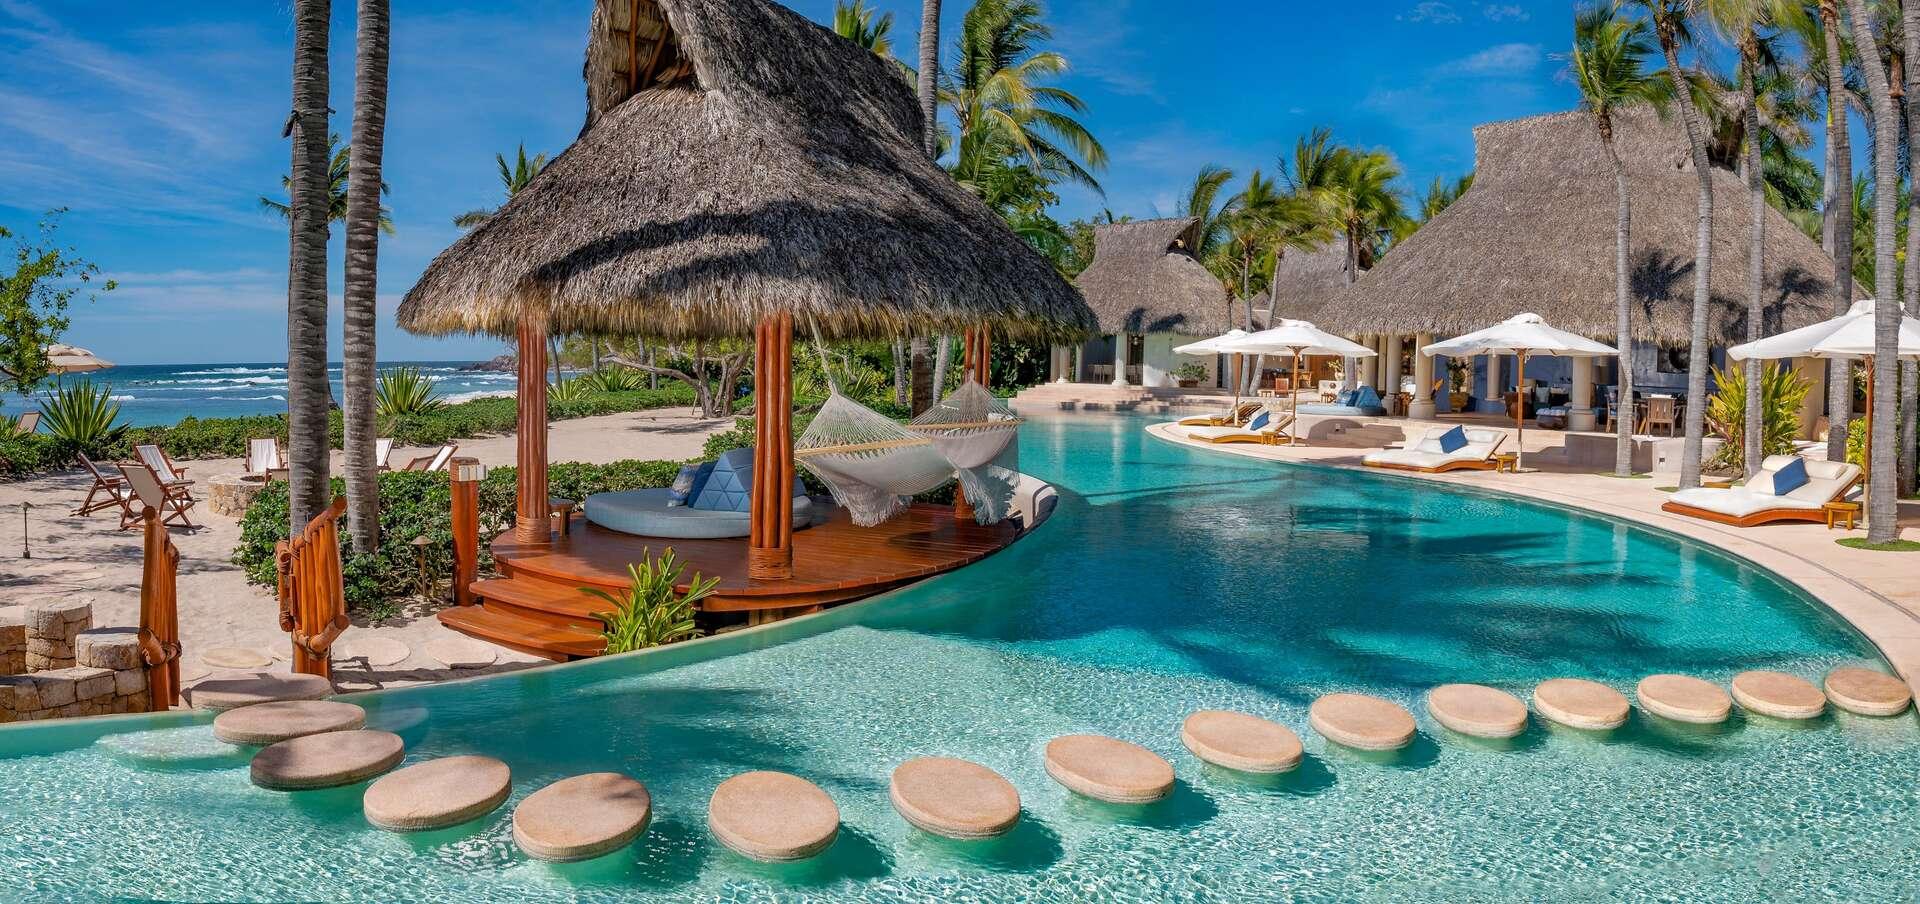 Luxury vacation rentals mexico - Punta mita - Signature estates - Palmasola - Image 1/38